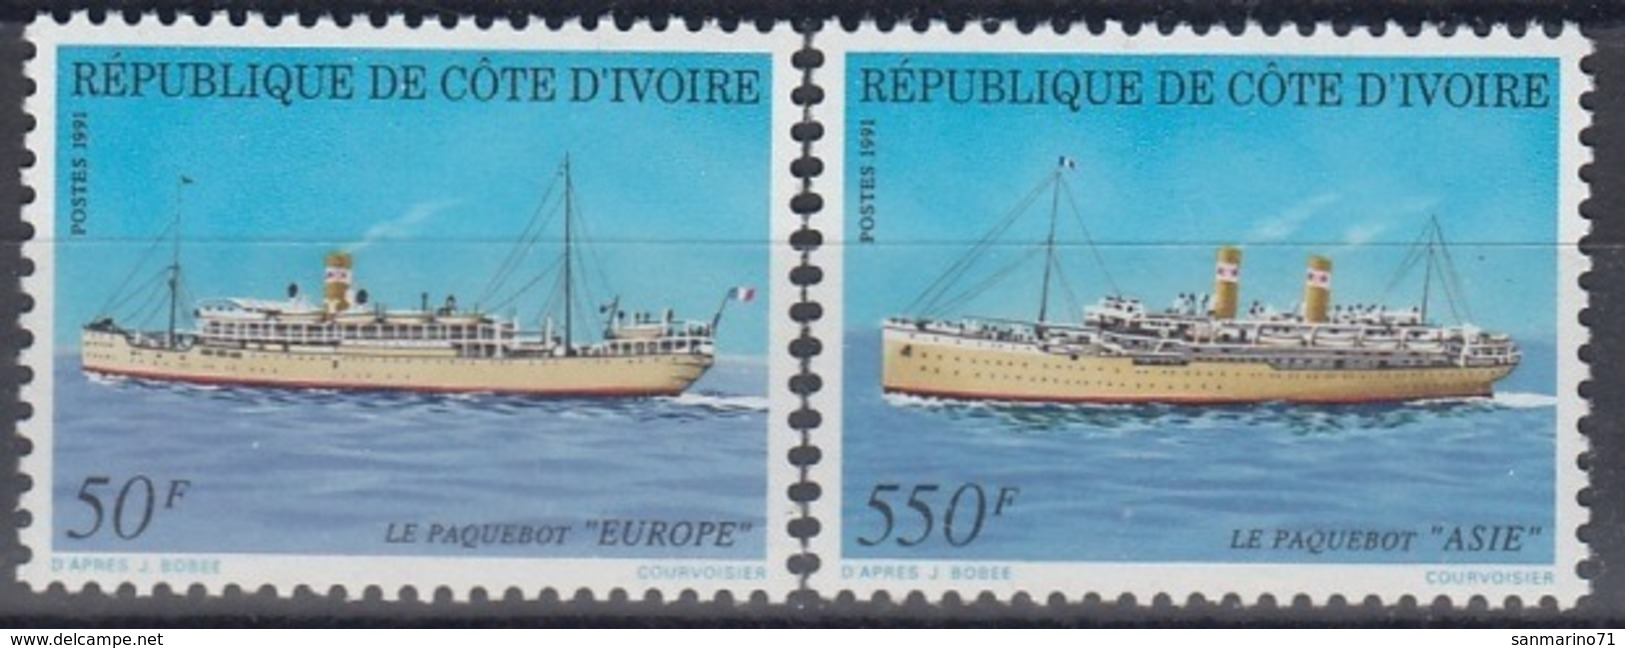 IVORY COAST 1047-1048,unused,ships - Costa De Marfil (1960-...)